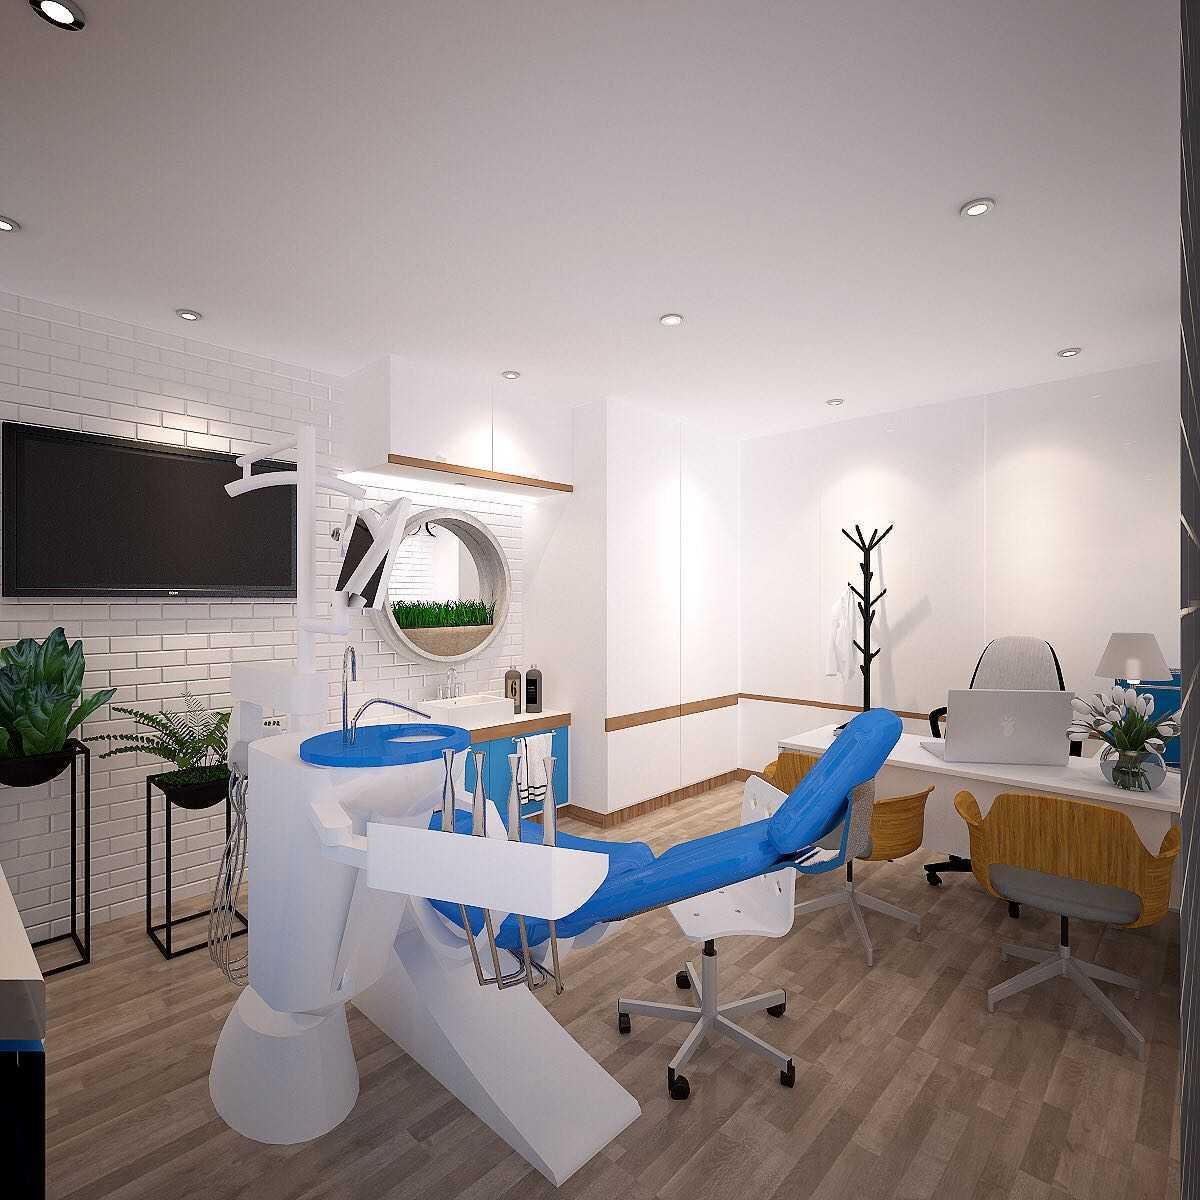 Ky Interior Design Klinik Gigi Noto Puri Indah Daerah Khusus Ibukota Jakarta, Indonesia Daerah Khusus Ibukota Jakarta, Indonesia Interior Clinic  48903